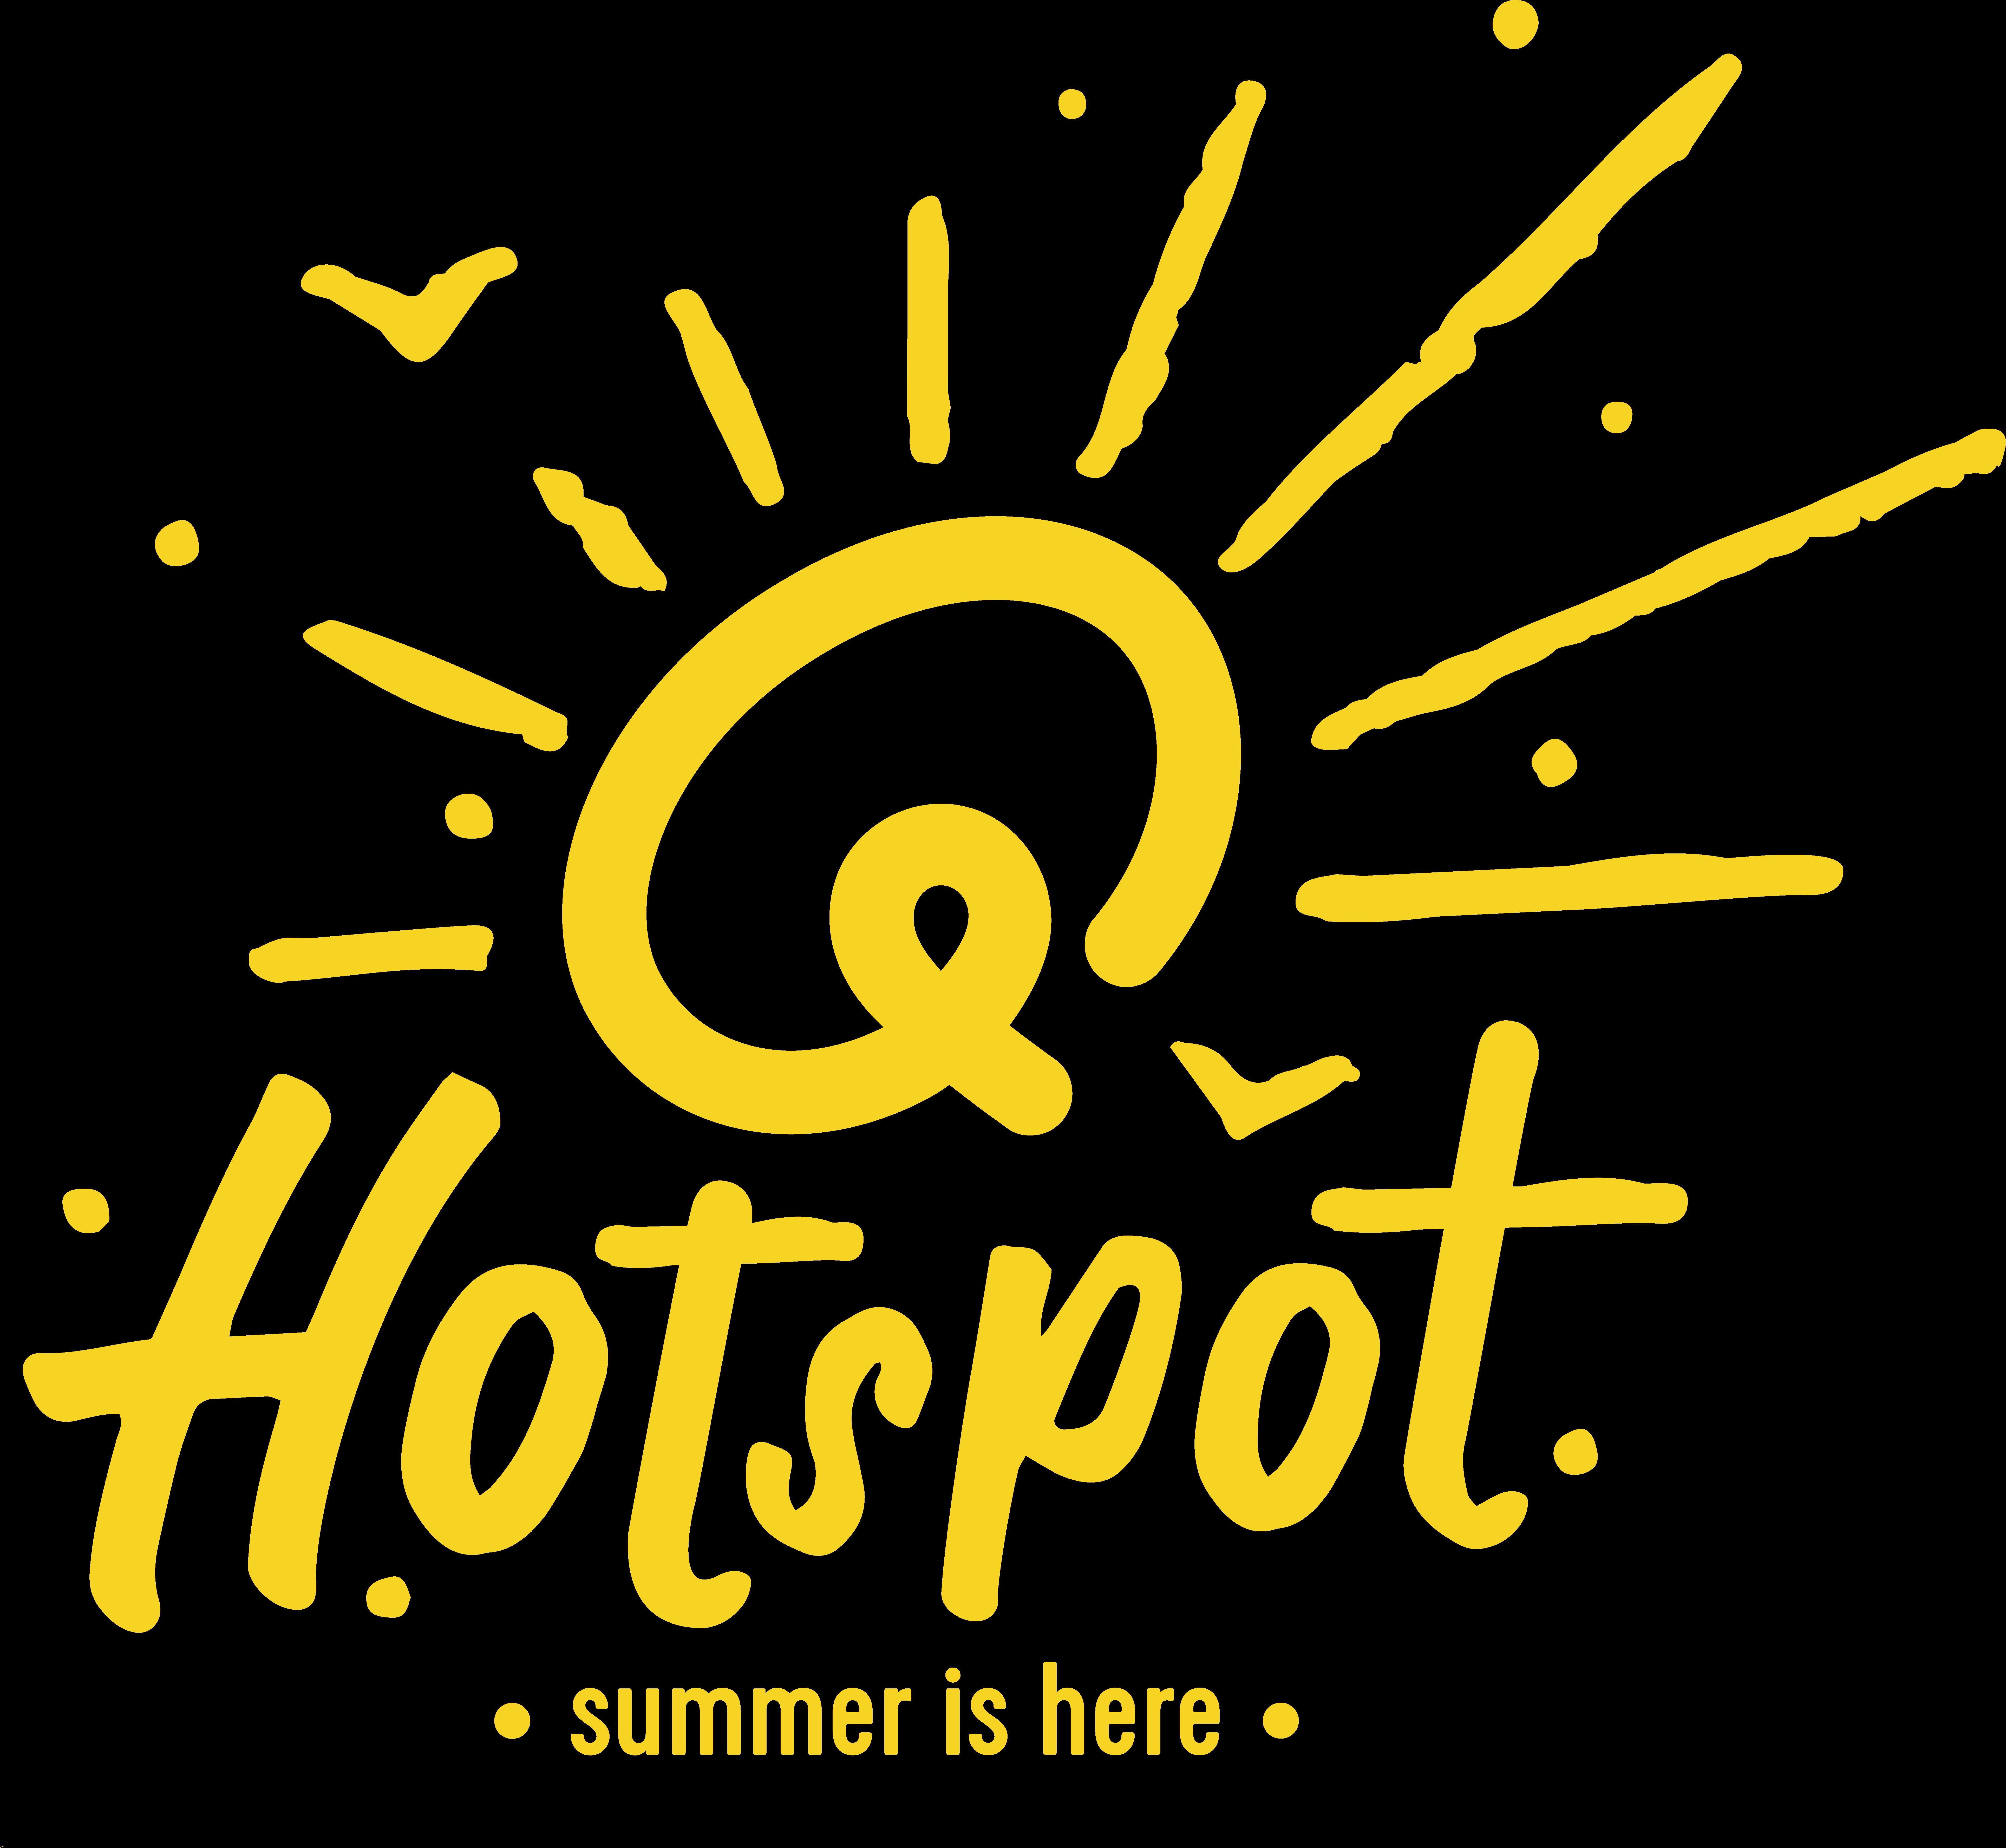 Qmusic verhuist van strand naar park - Logo Q hotspot